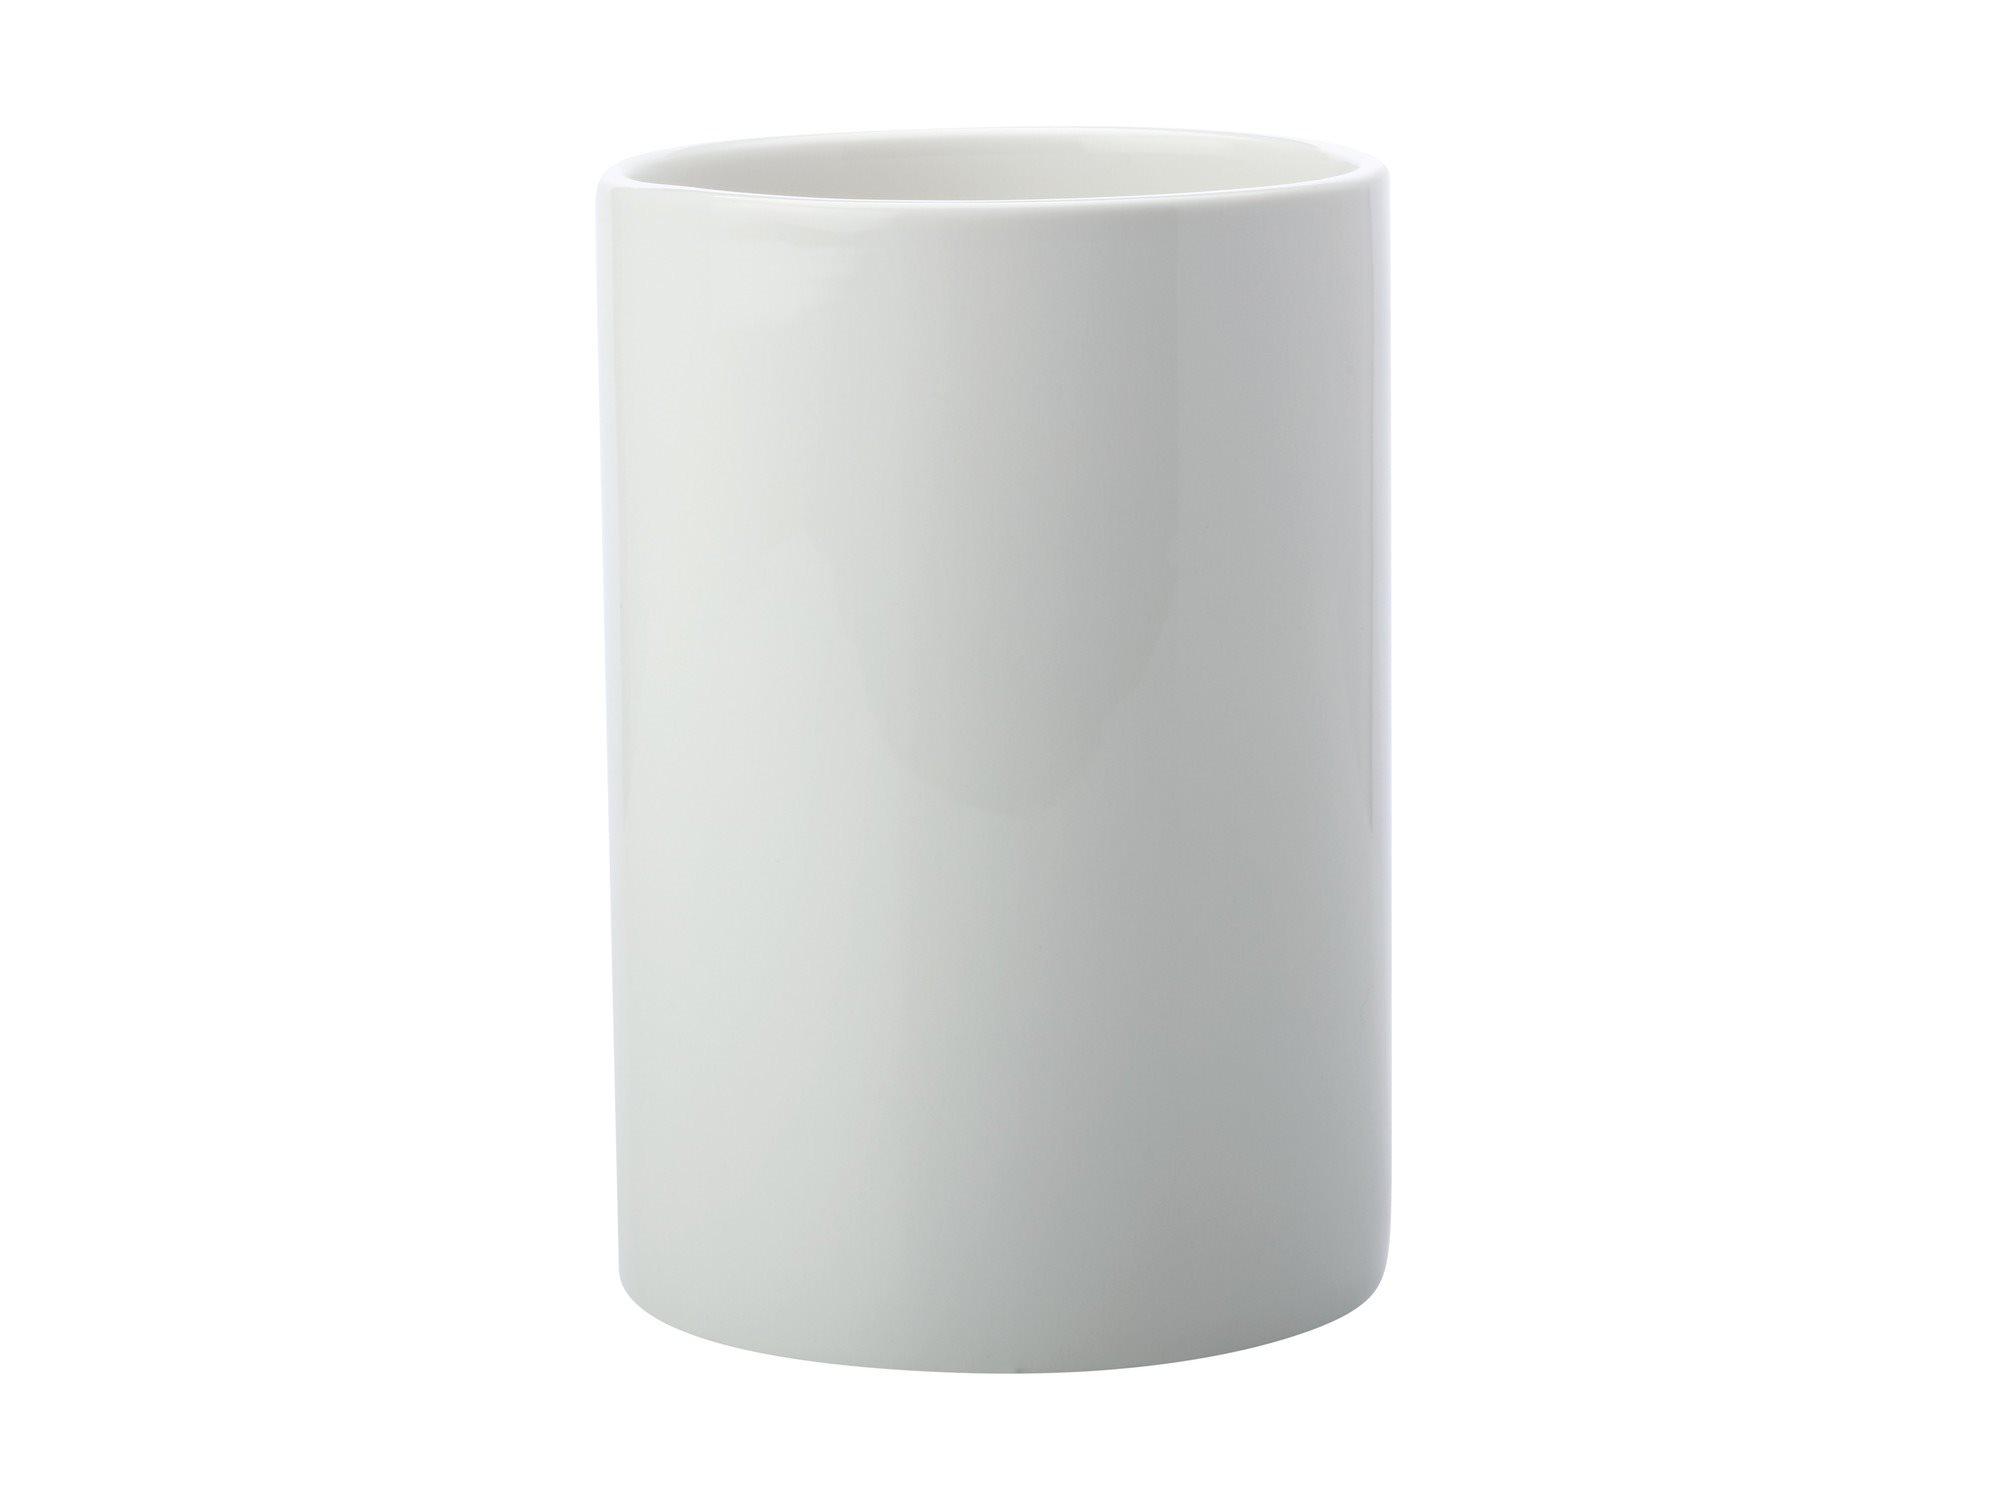 Maxwell & Williams Δοχείο για Κουτάλες Πορσελάνης Λευκό Epicurious